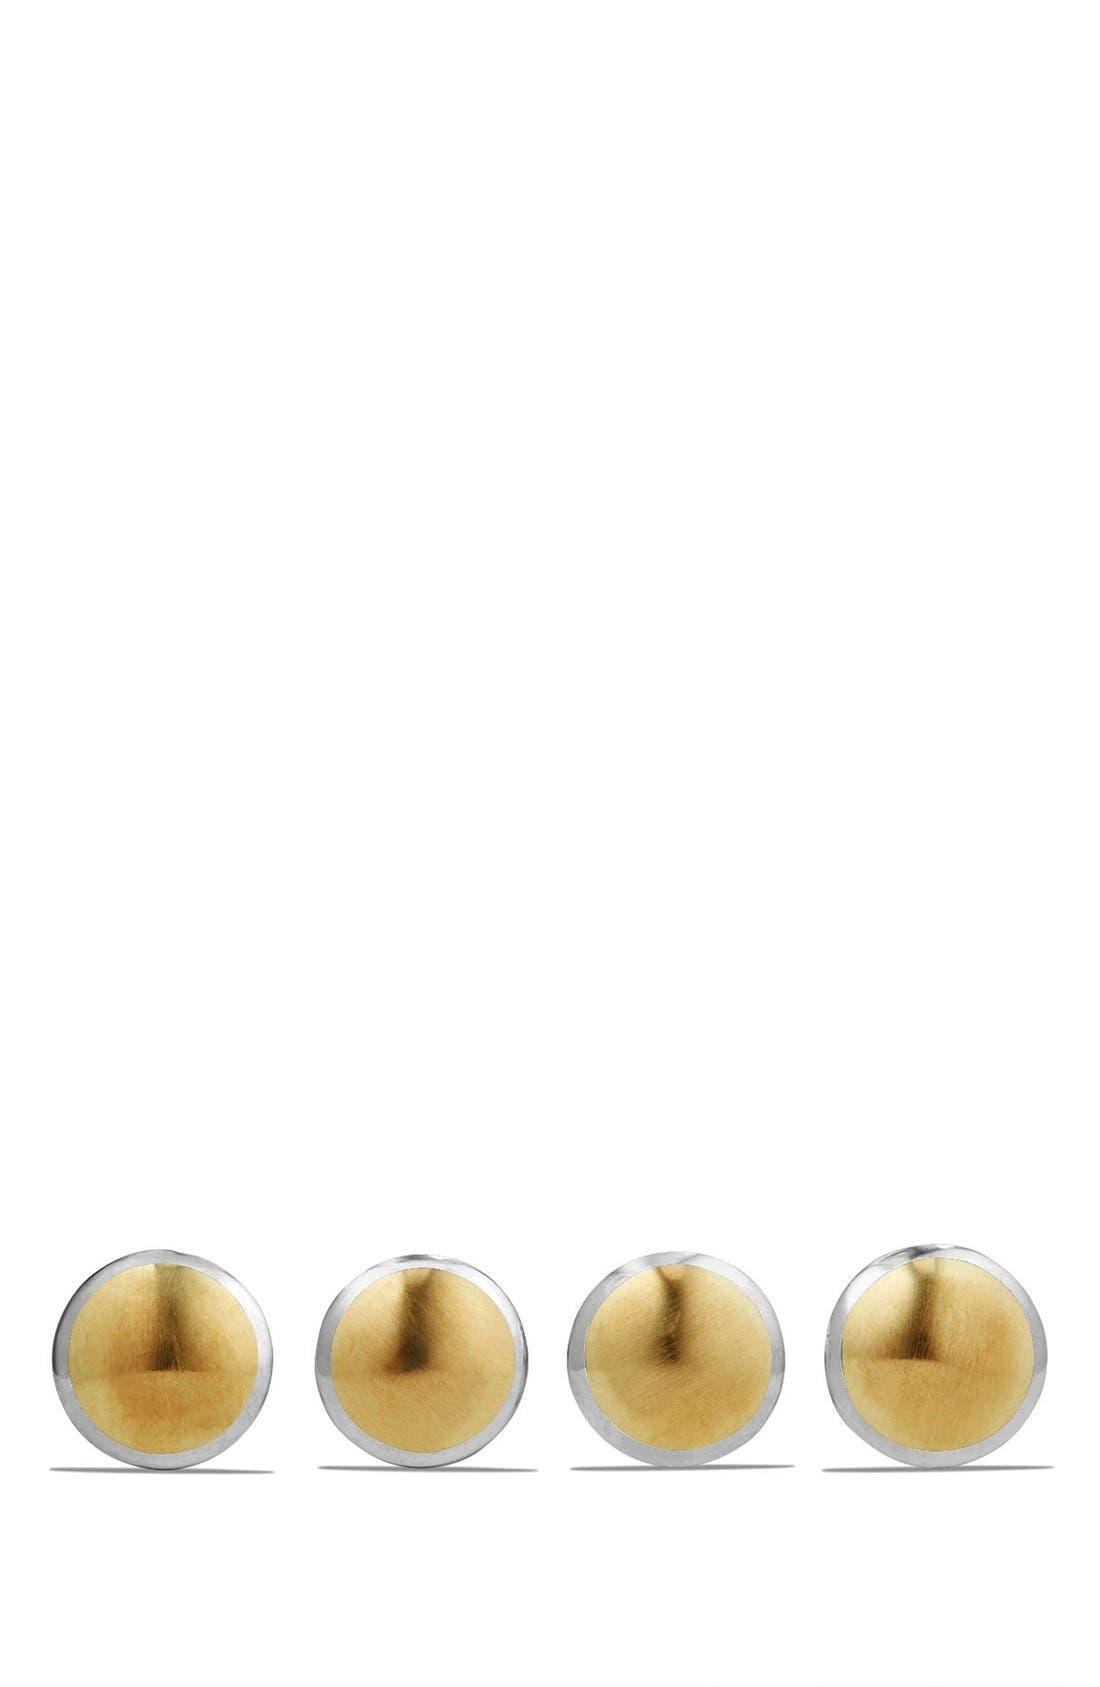 David Yurman Streamline Set of 4 Shirt Studs with 18K Gold